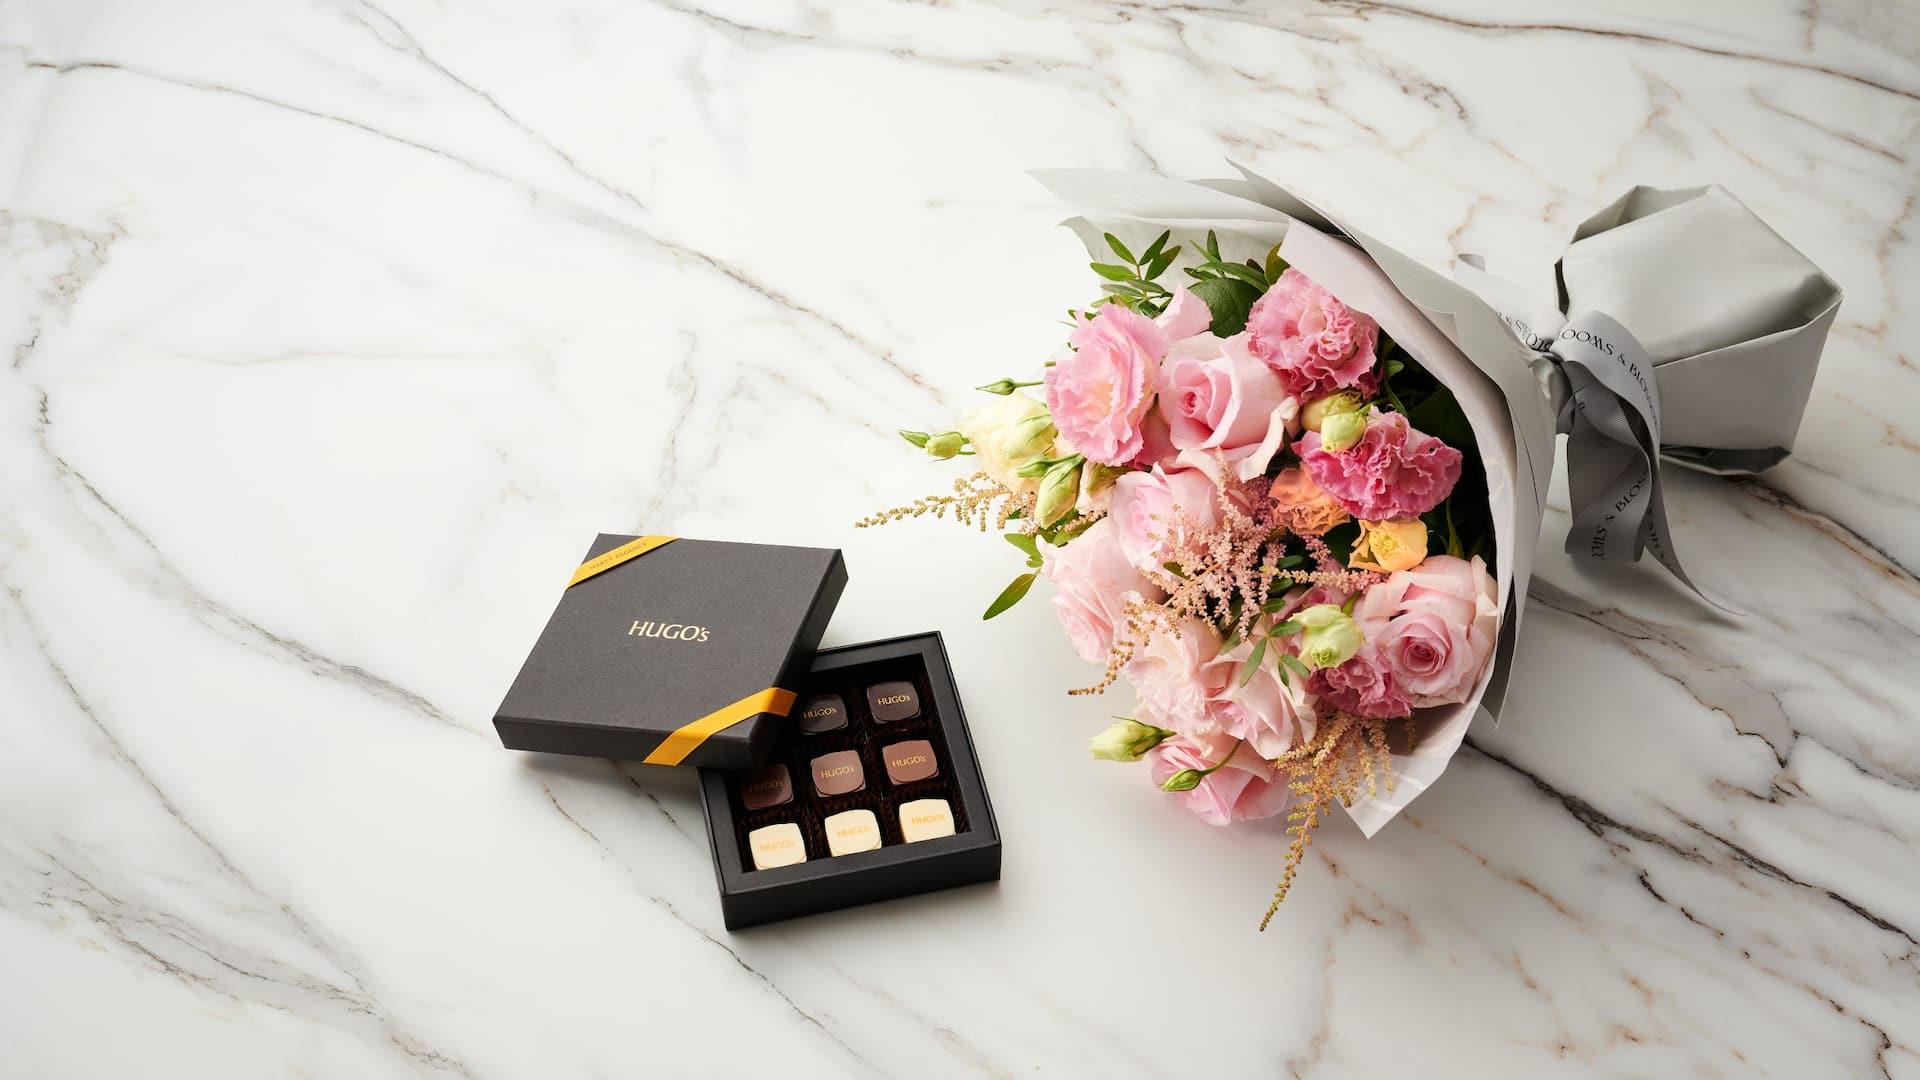 Hugo's Pralines and Bouquet